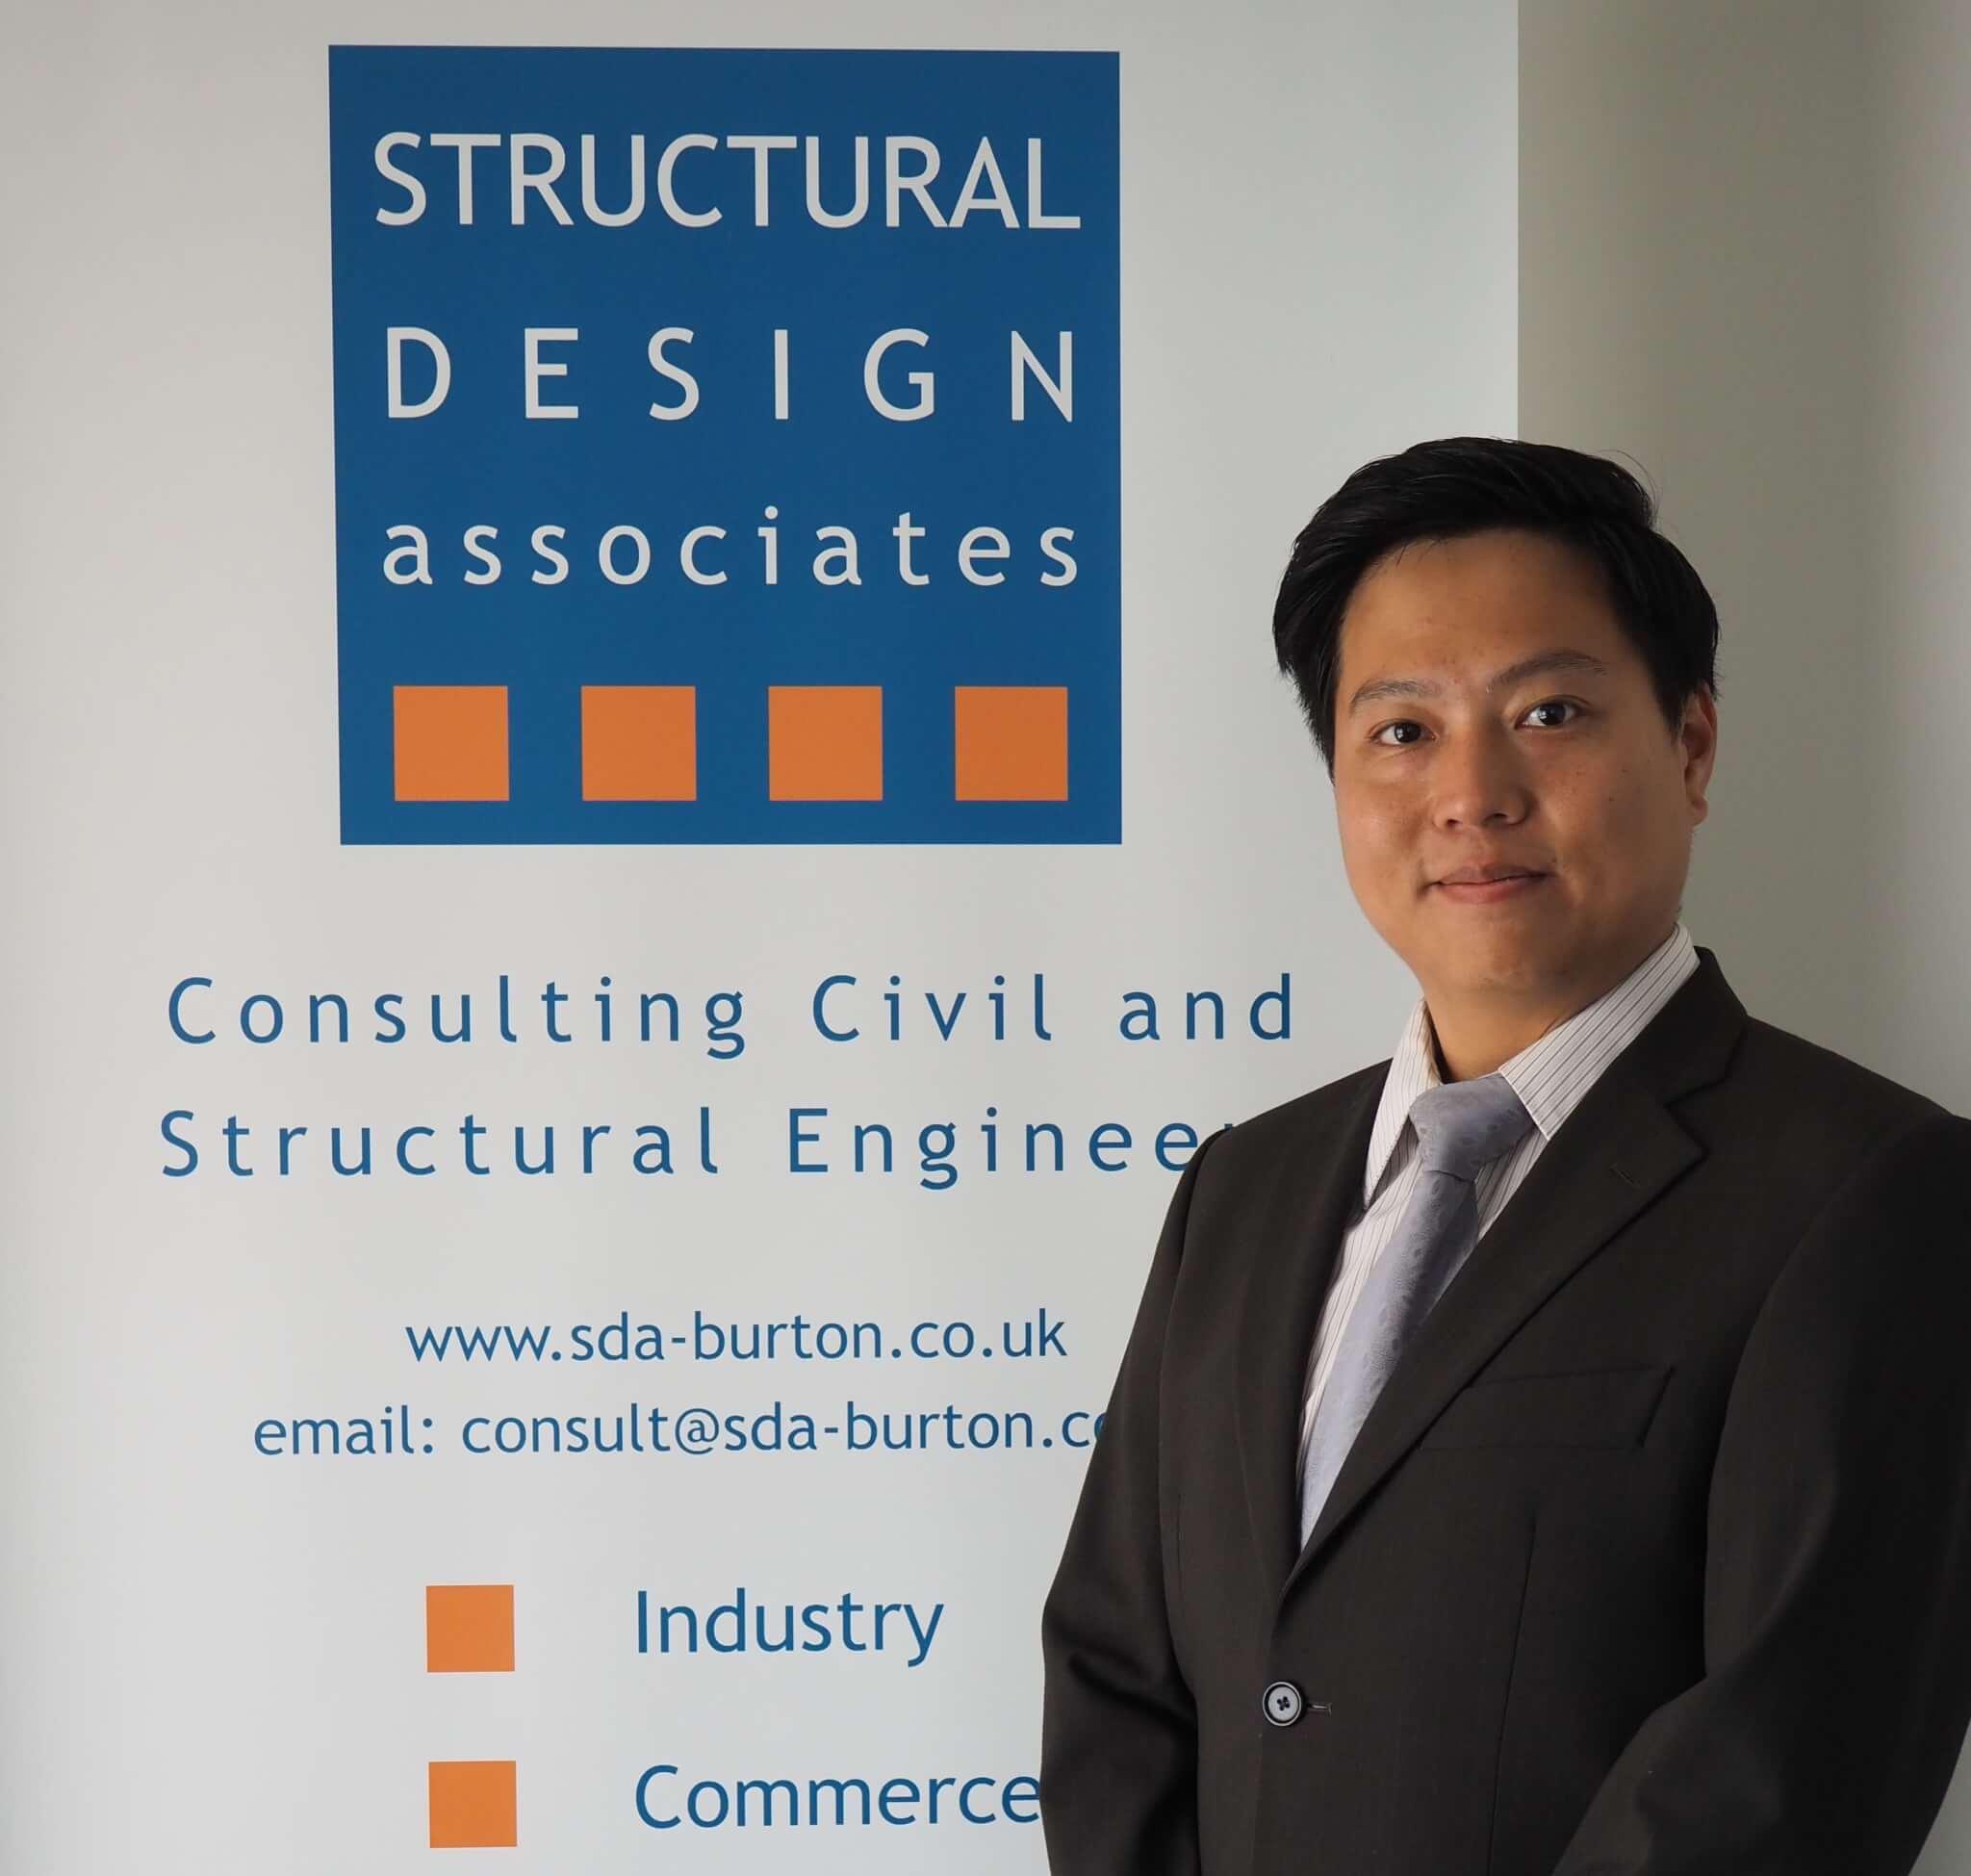 Structural Design Associates